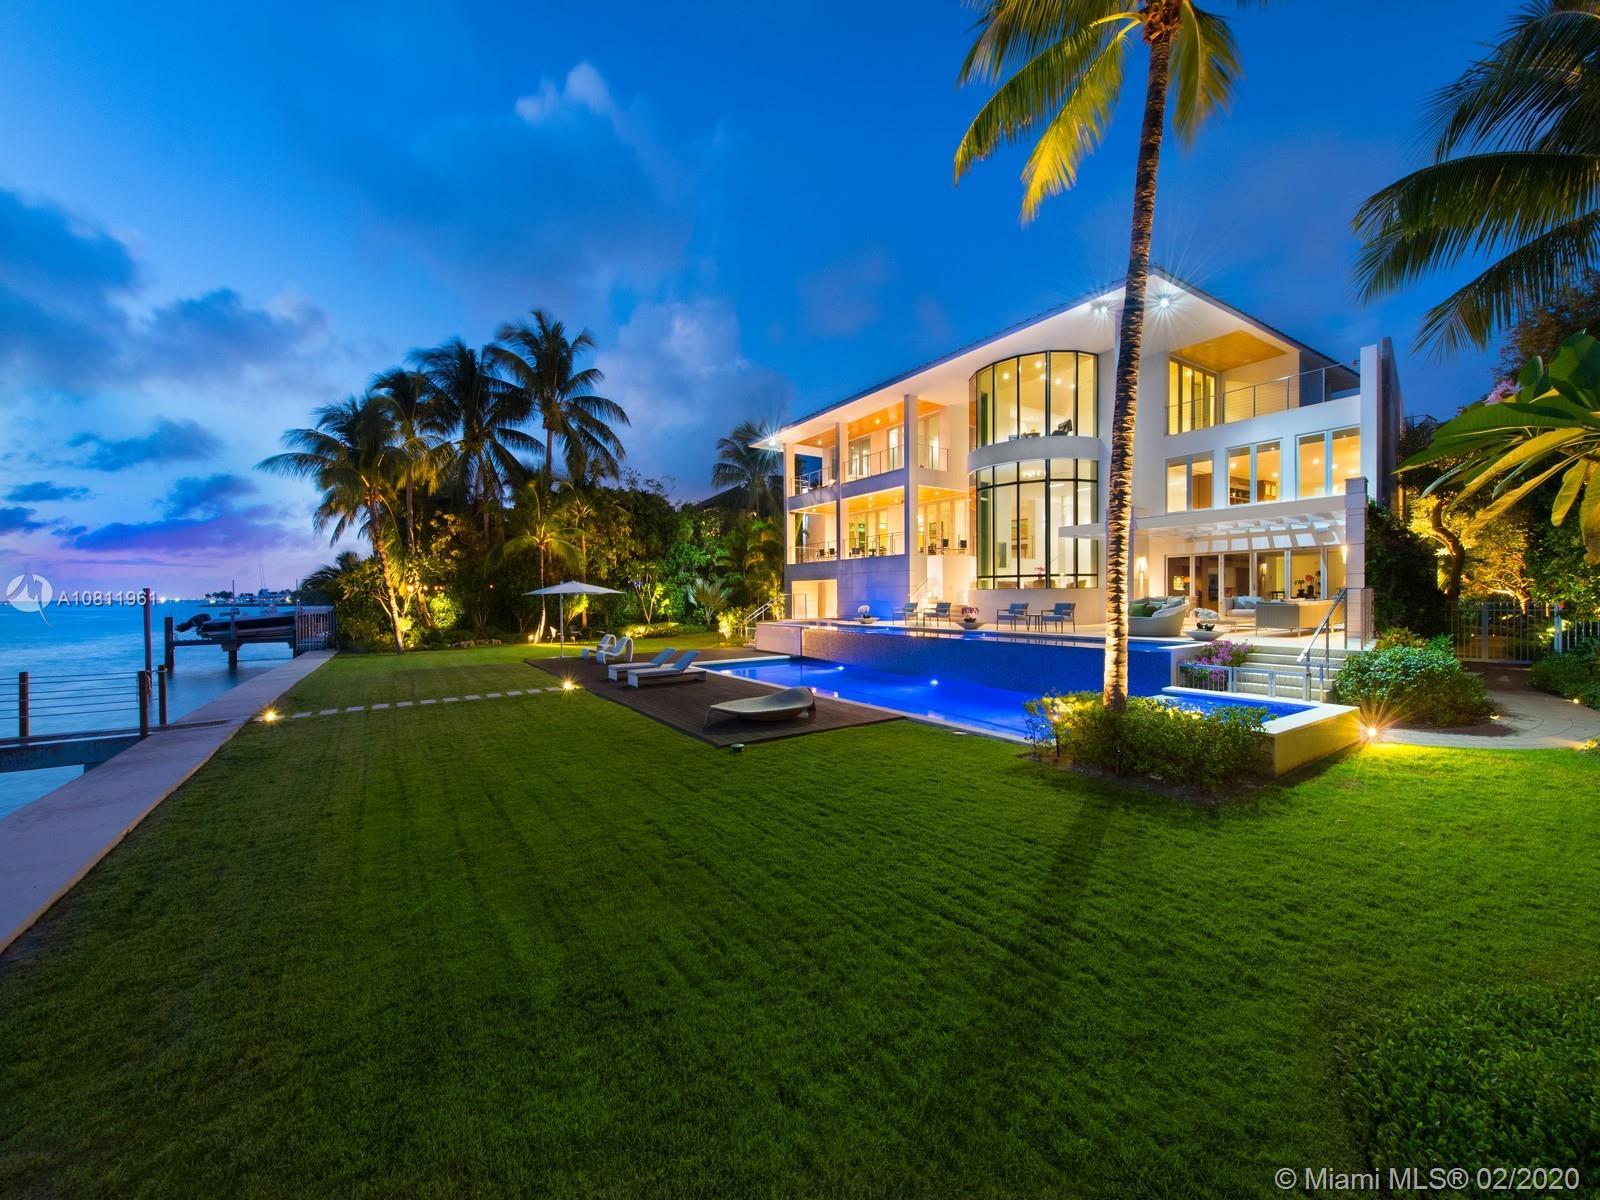 Key Biscayne Miami Real Estate Trends View this real estate listing for sale at 545 glenridge road, key biscayne, fl, mls# a10244240 on onesothebysrealty.com. miami real estate trends